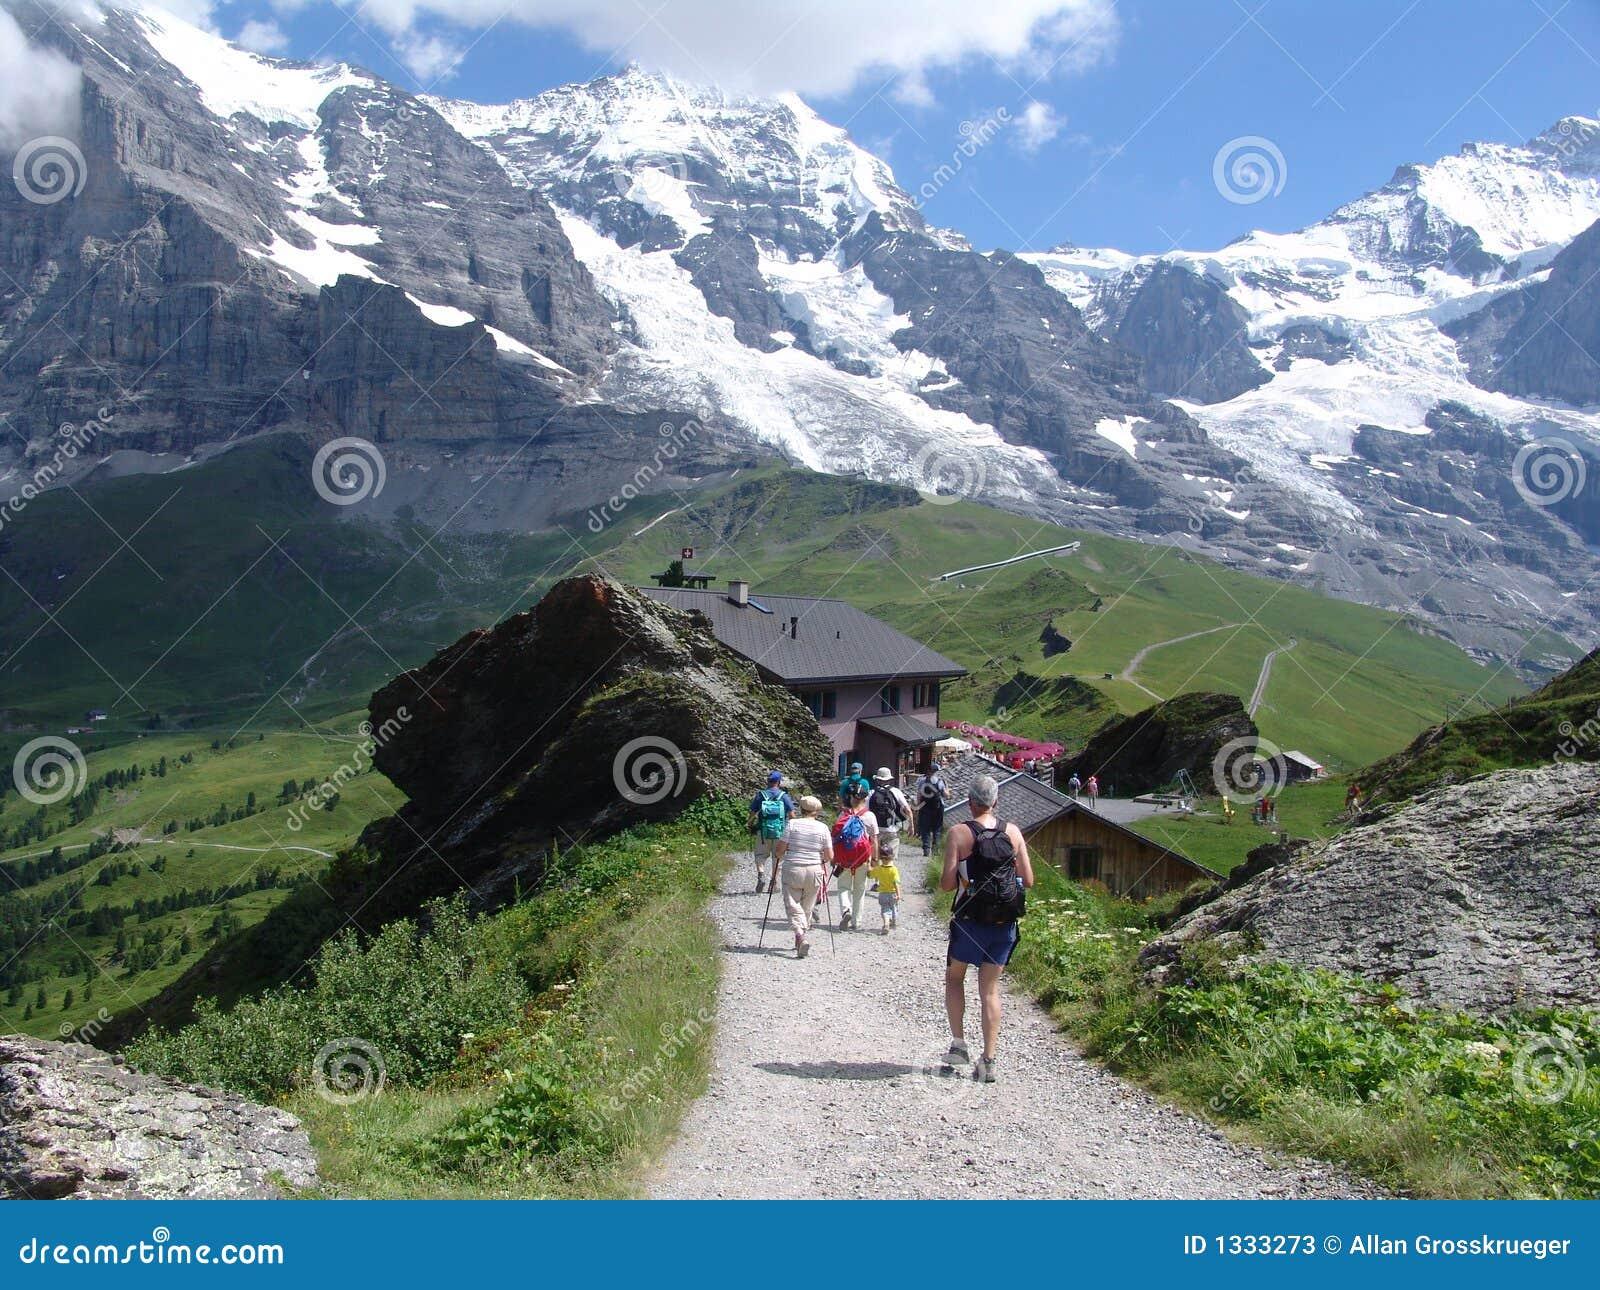 Hiking The Jungfrau Mountain Area Stock Image Image of trail